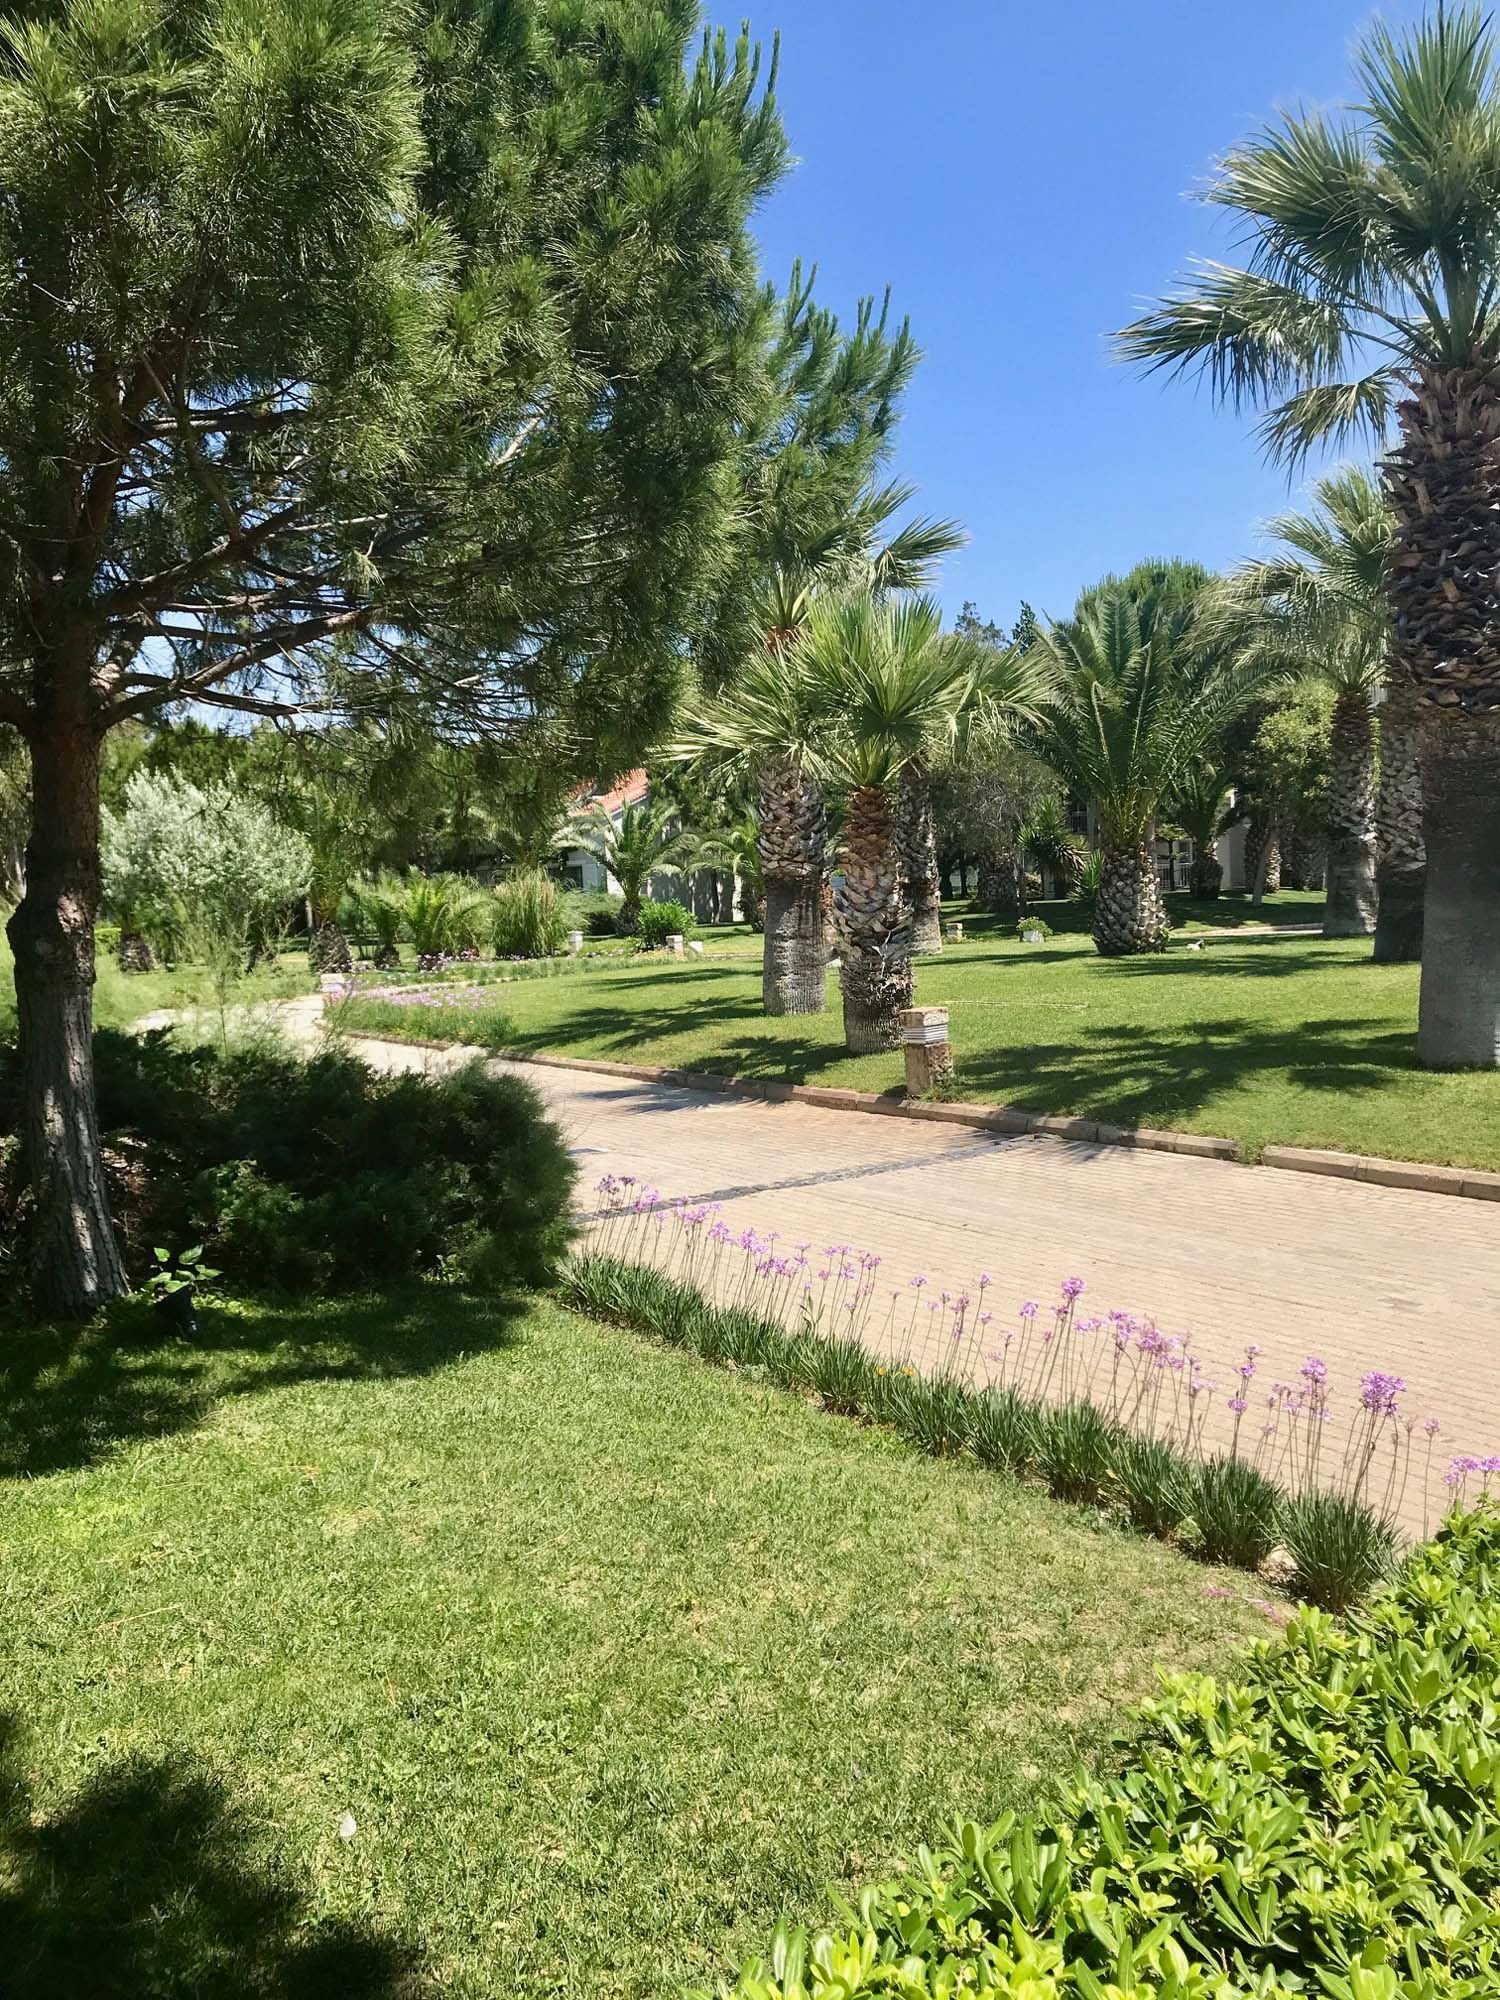 The resort's gardens